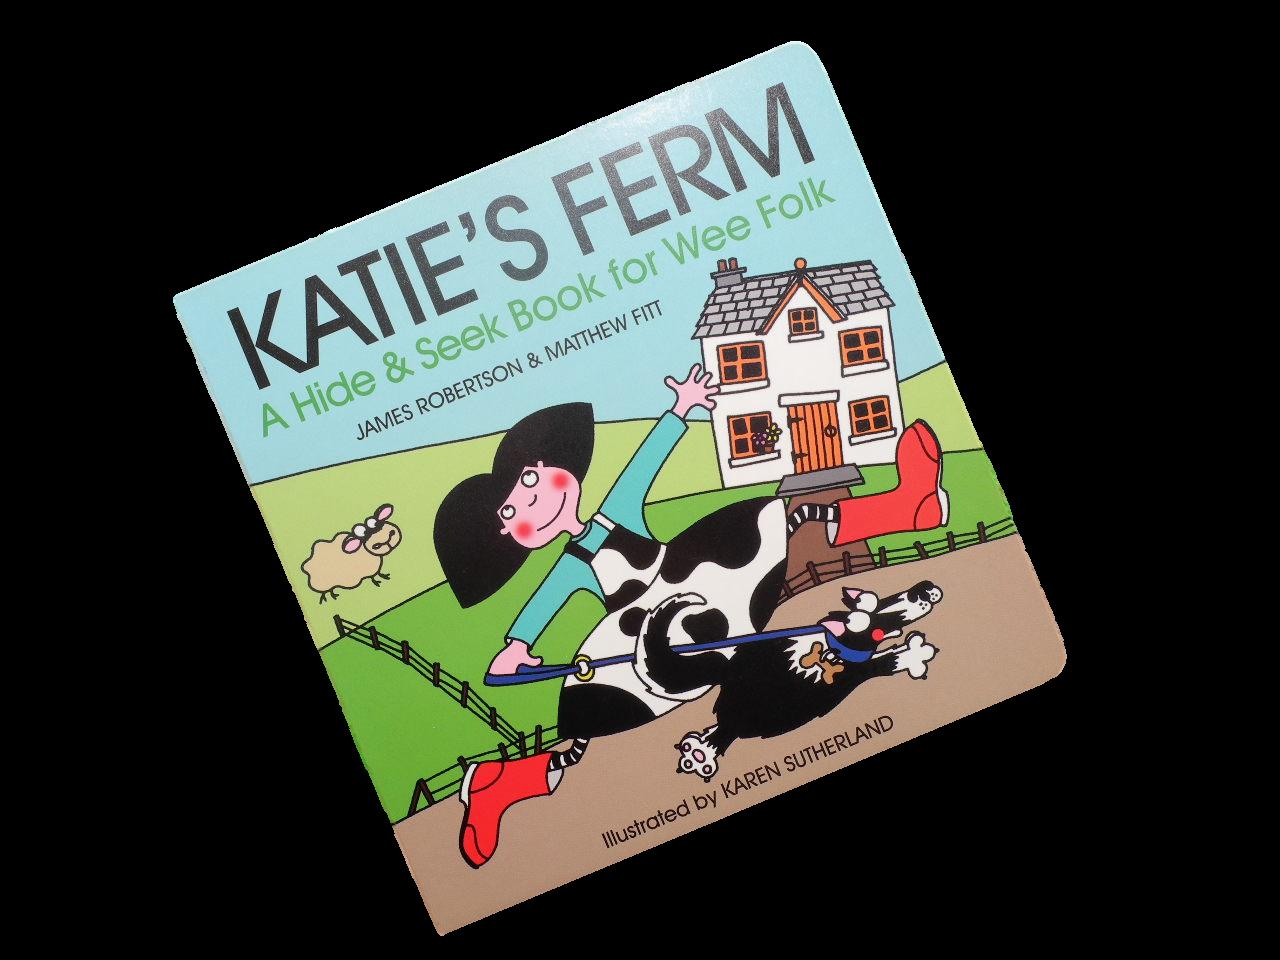 scottish book for children katies ferm doric scots language matthew fitt james robertson